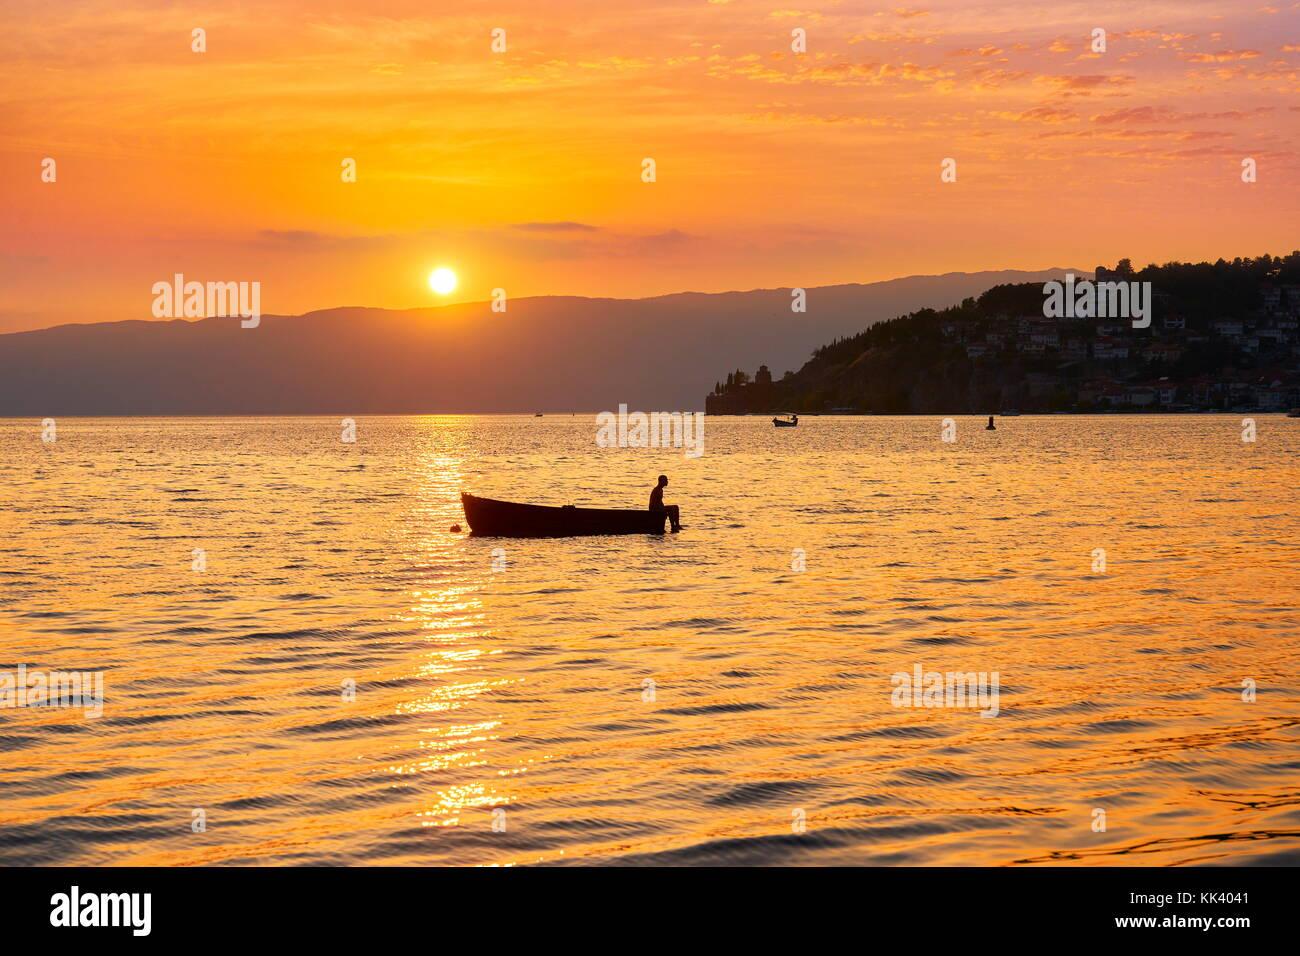 Ohrid Lake at sunset time, Macedonia - Stock Image